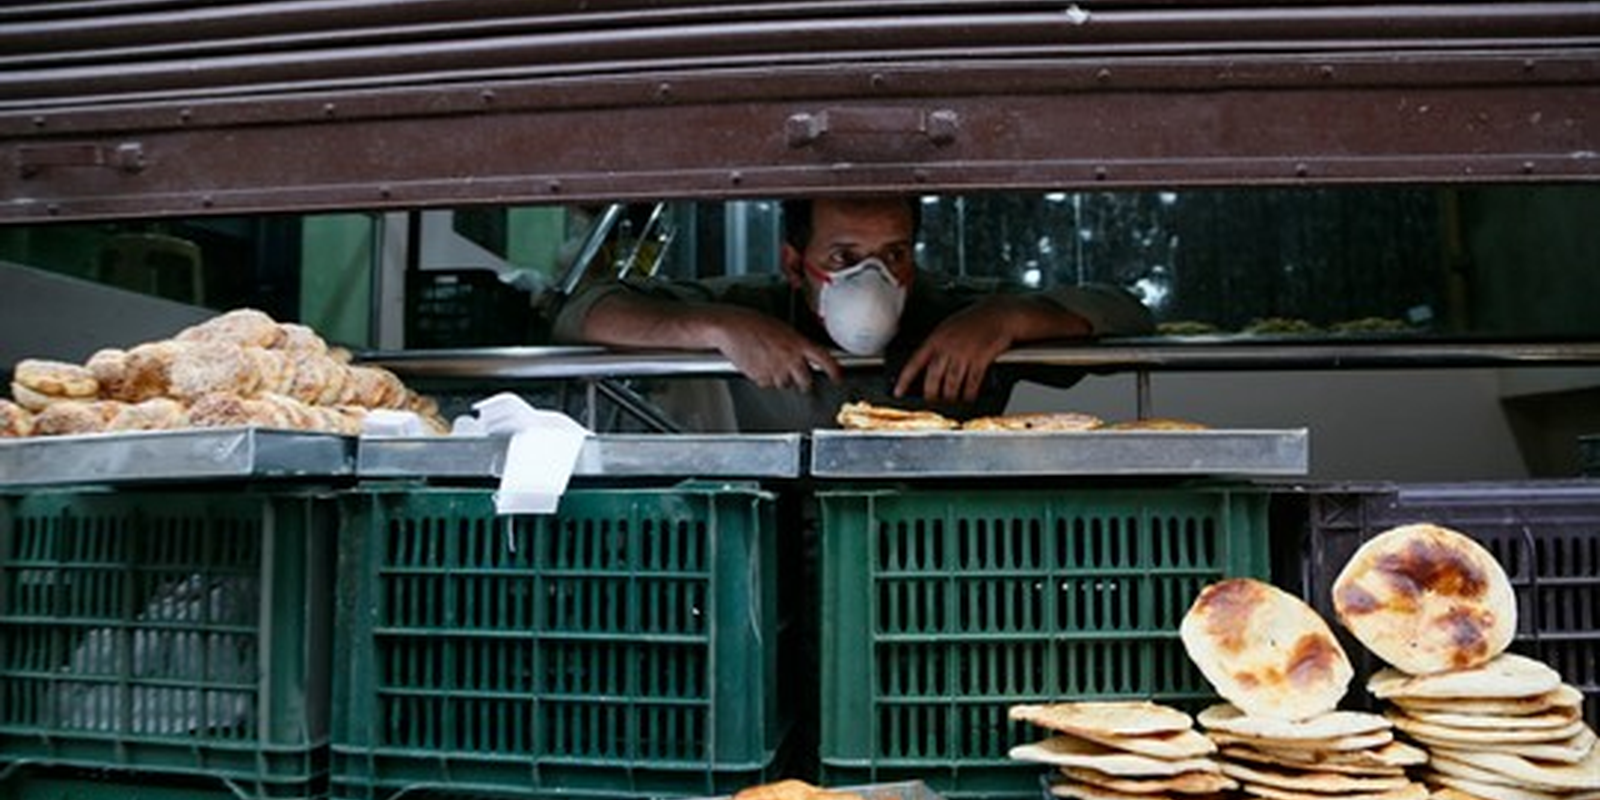 A Kashmiri man waits for customers behind a half-closed shutter during a nationwide lockdown to control the spread of the coronavirus, in Srinagar, Kashmir, May 16, 2020 (AP photo by Mukhtar Khan).